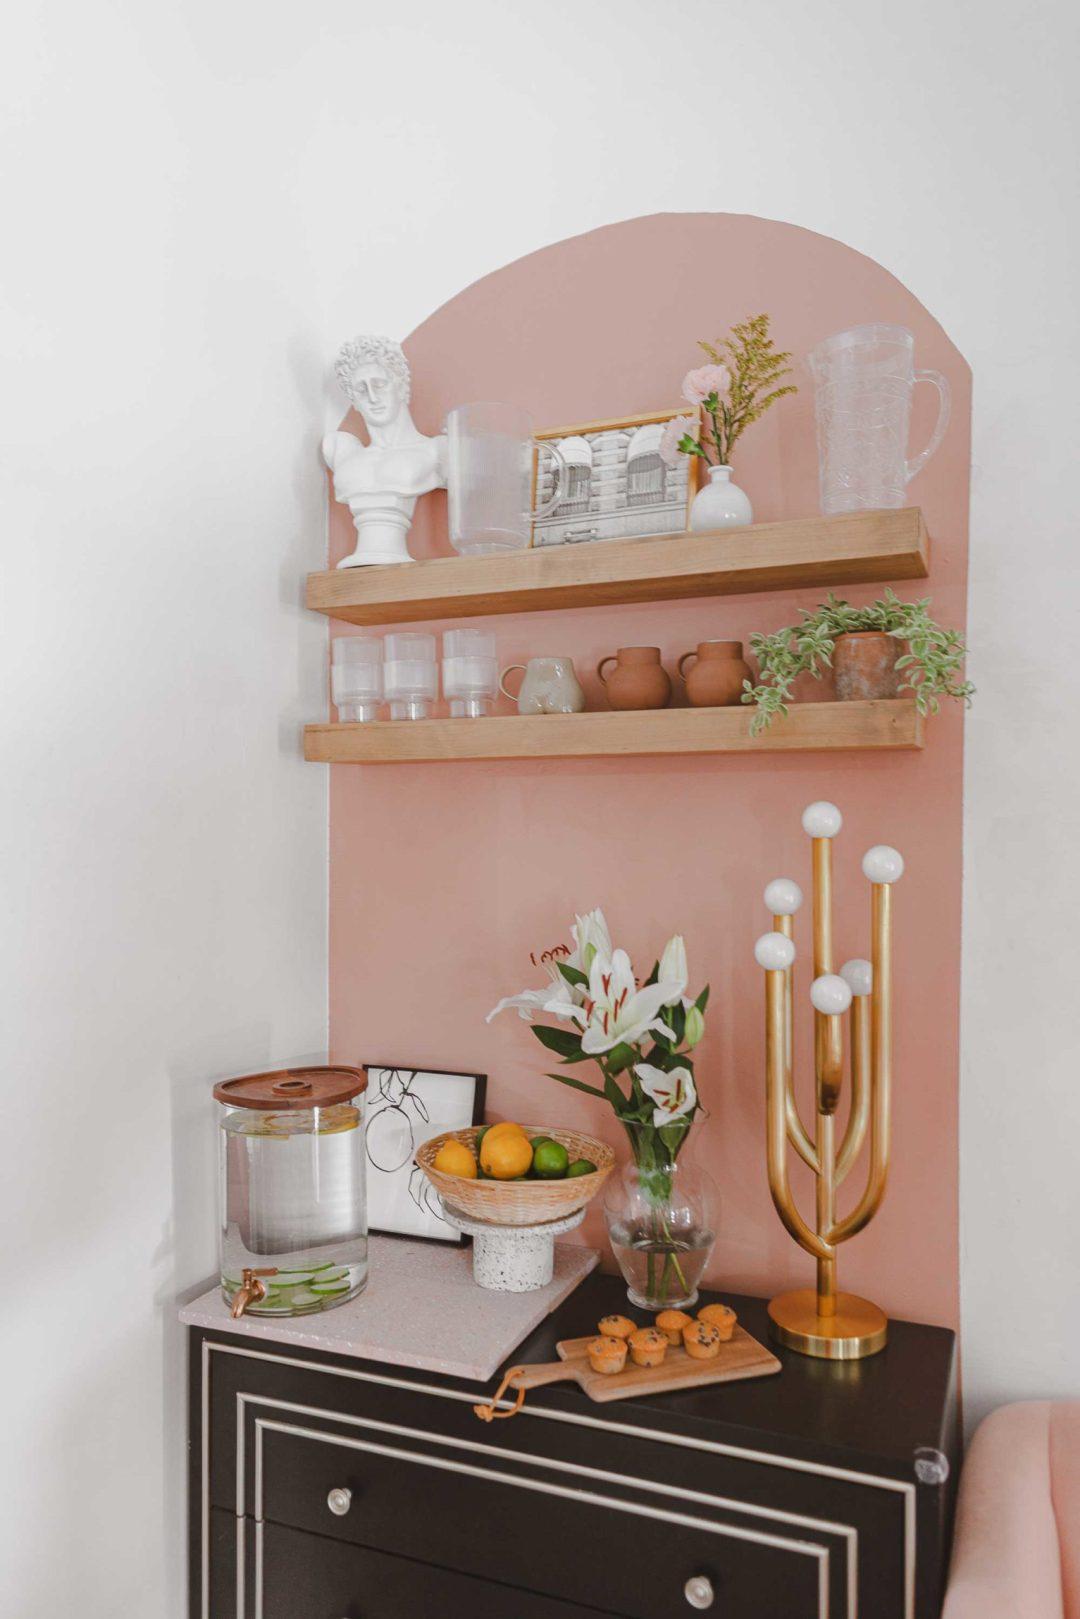 snack bar decor idea for your home